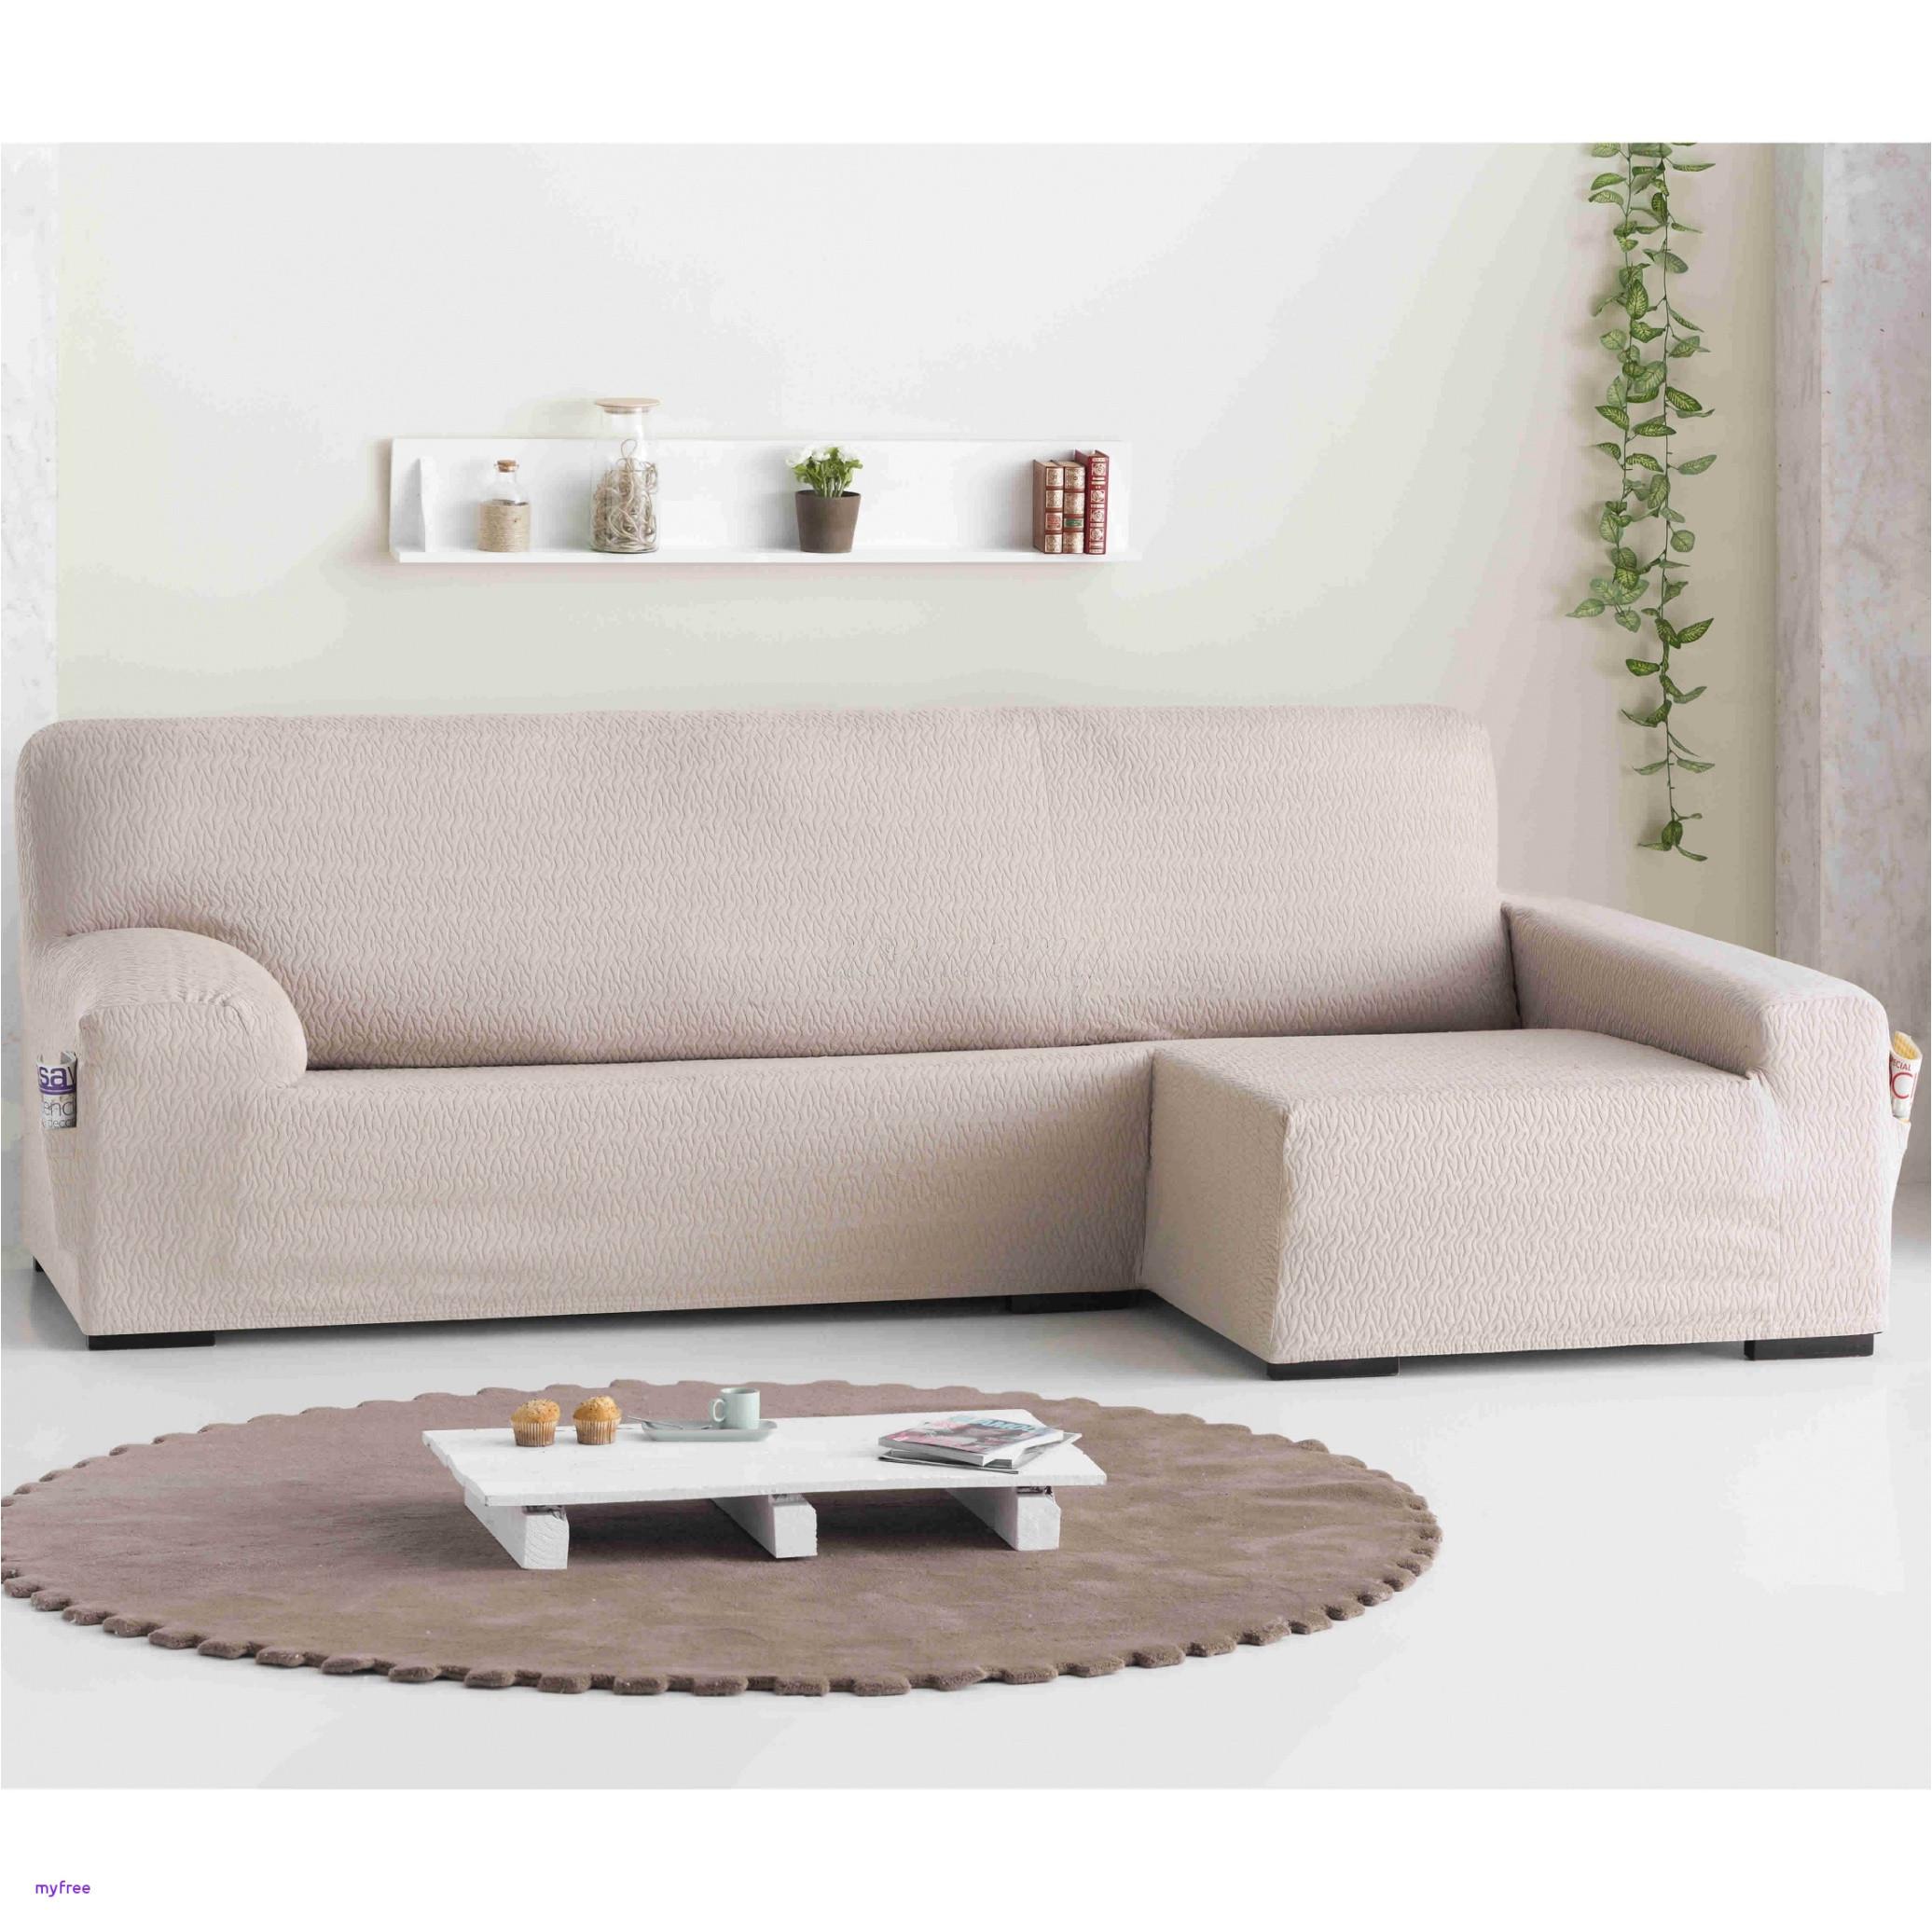 37 impresionante funda para sofa chaise longue concepto